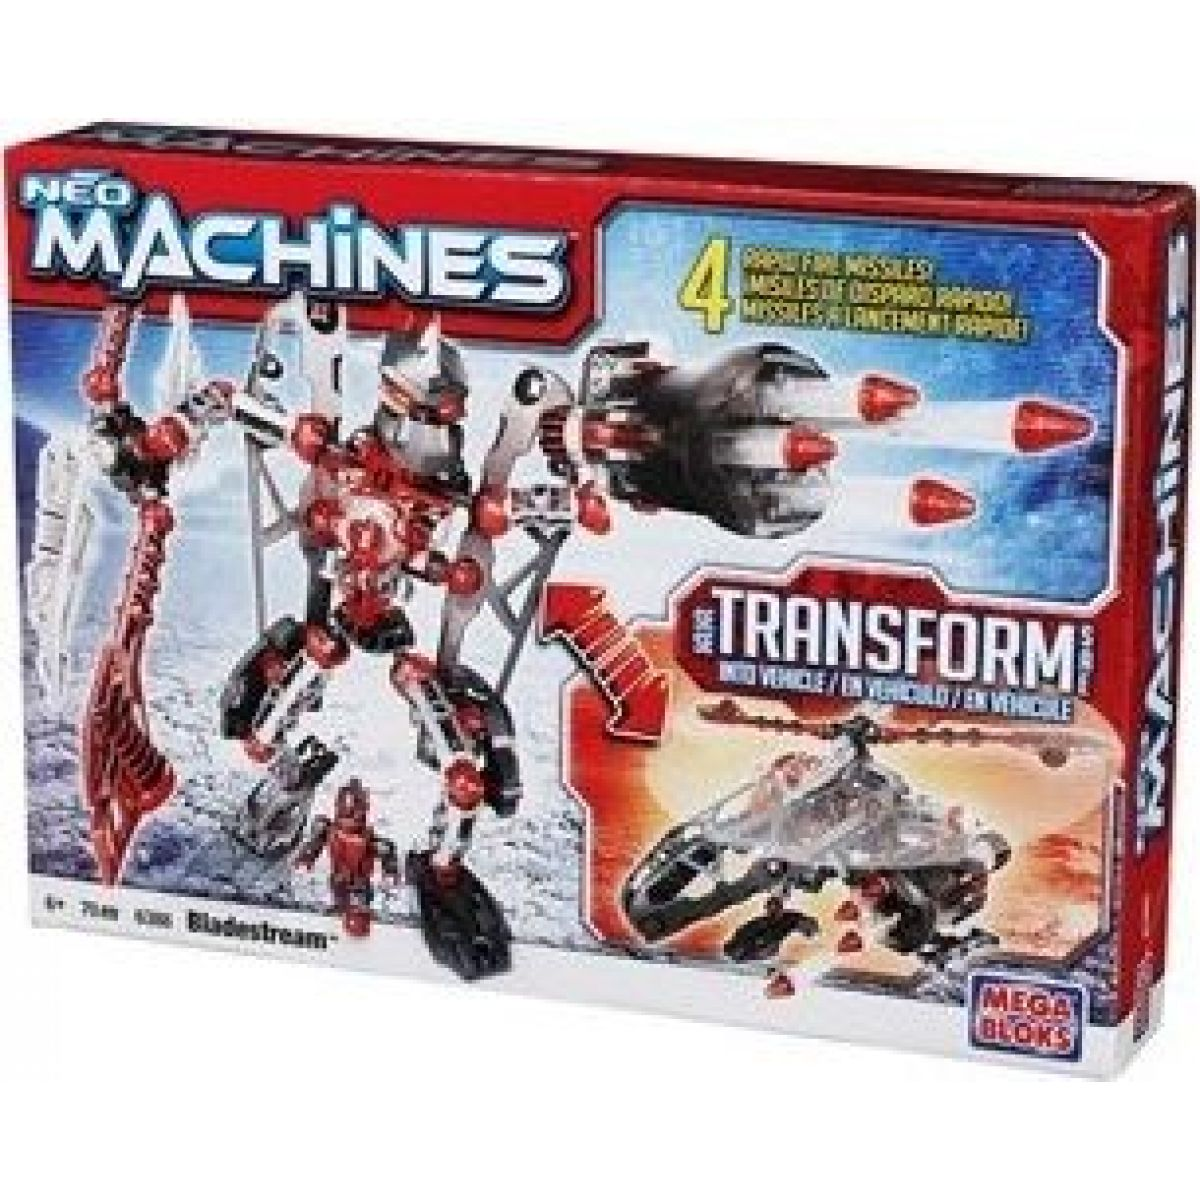 Megabloks 6388 Neo Machines Bladestream